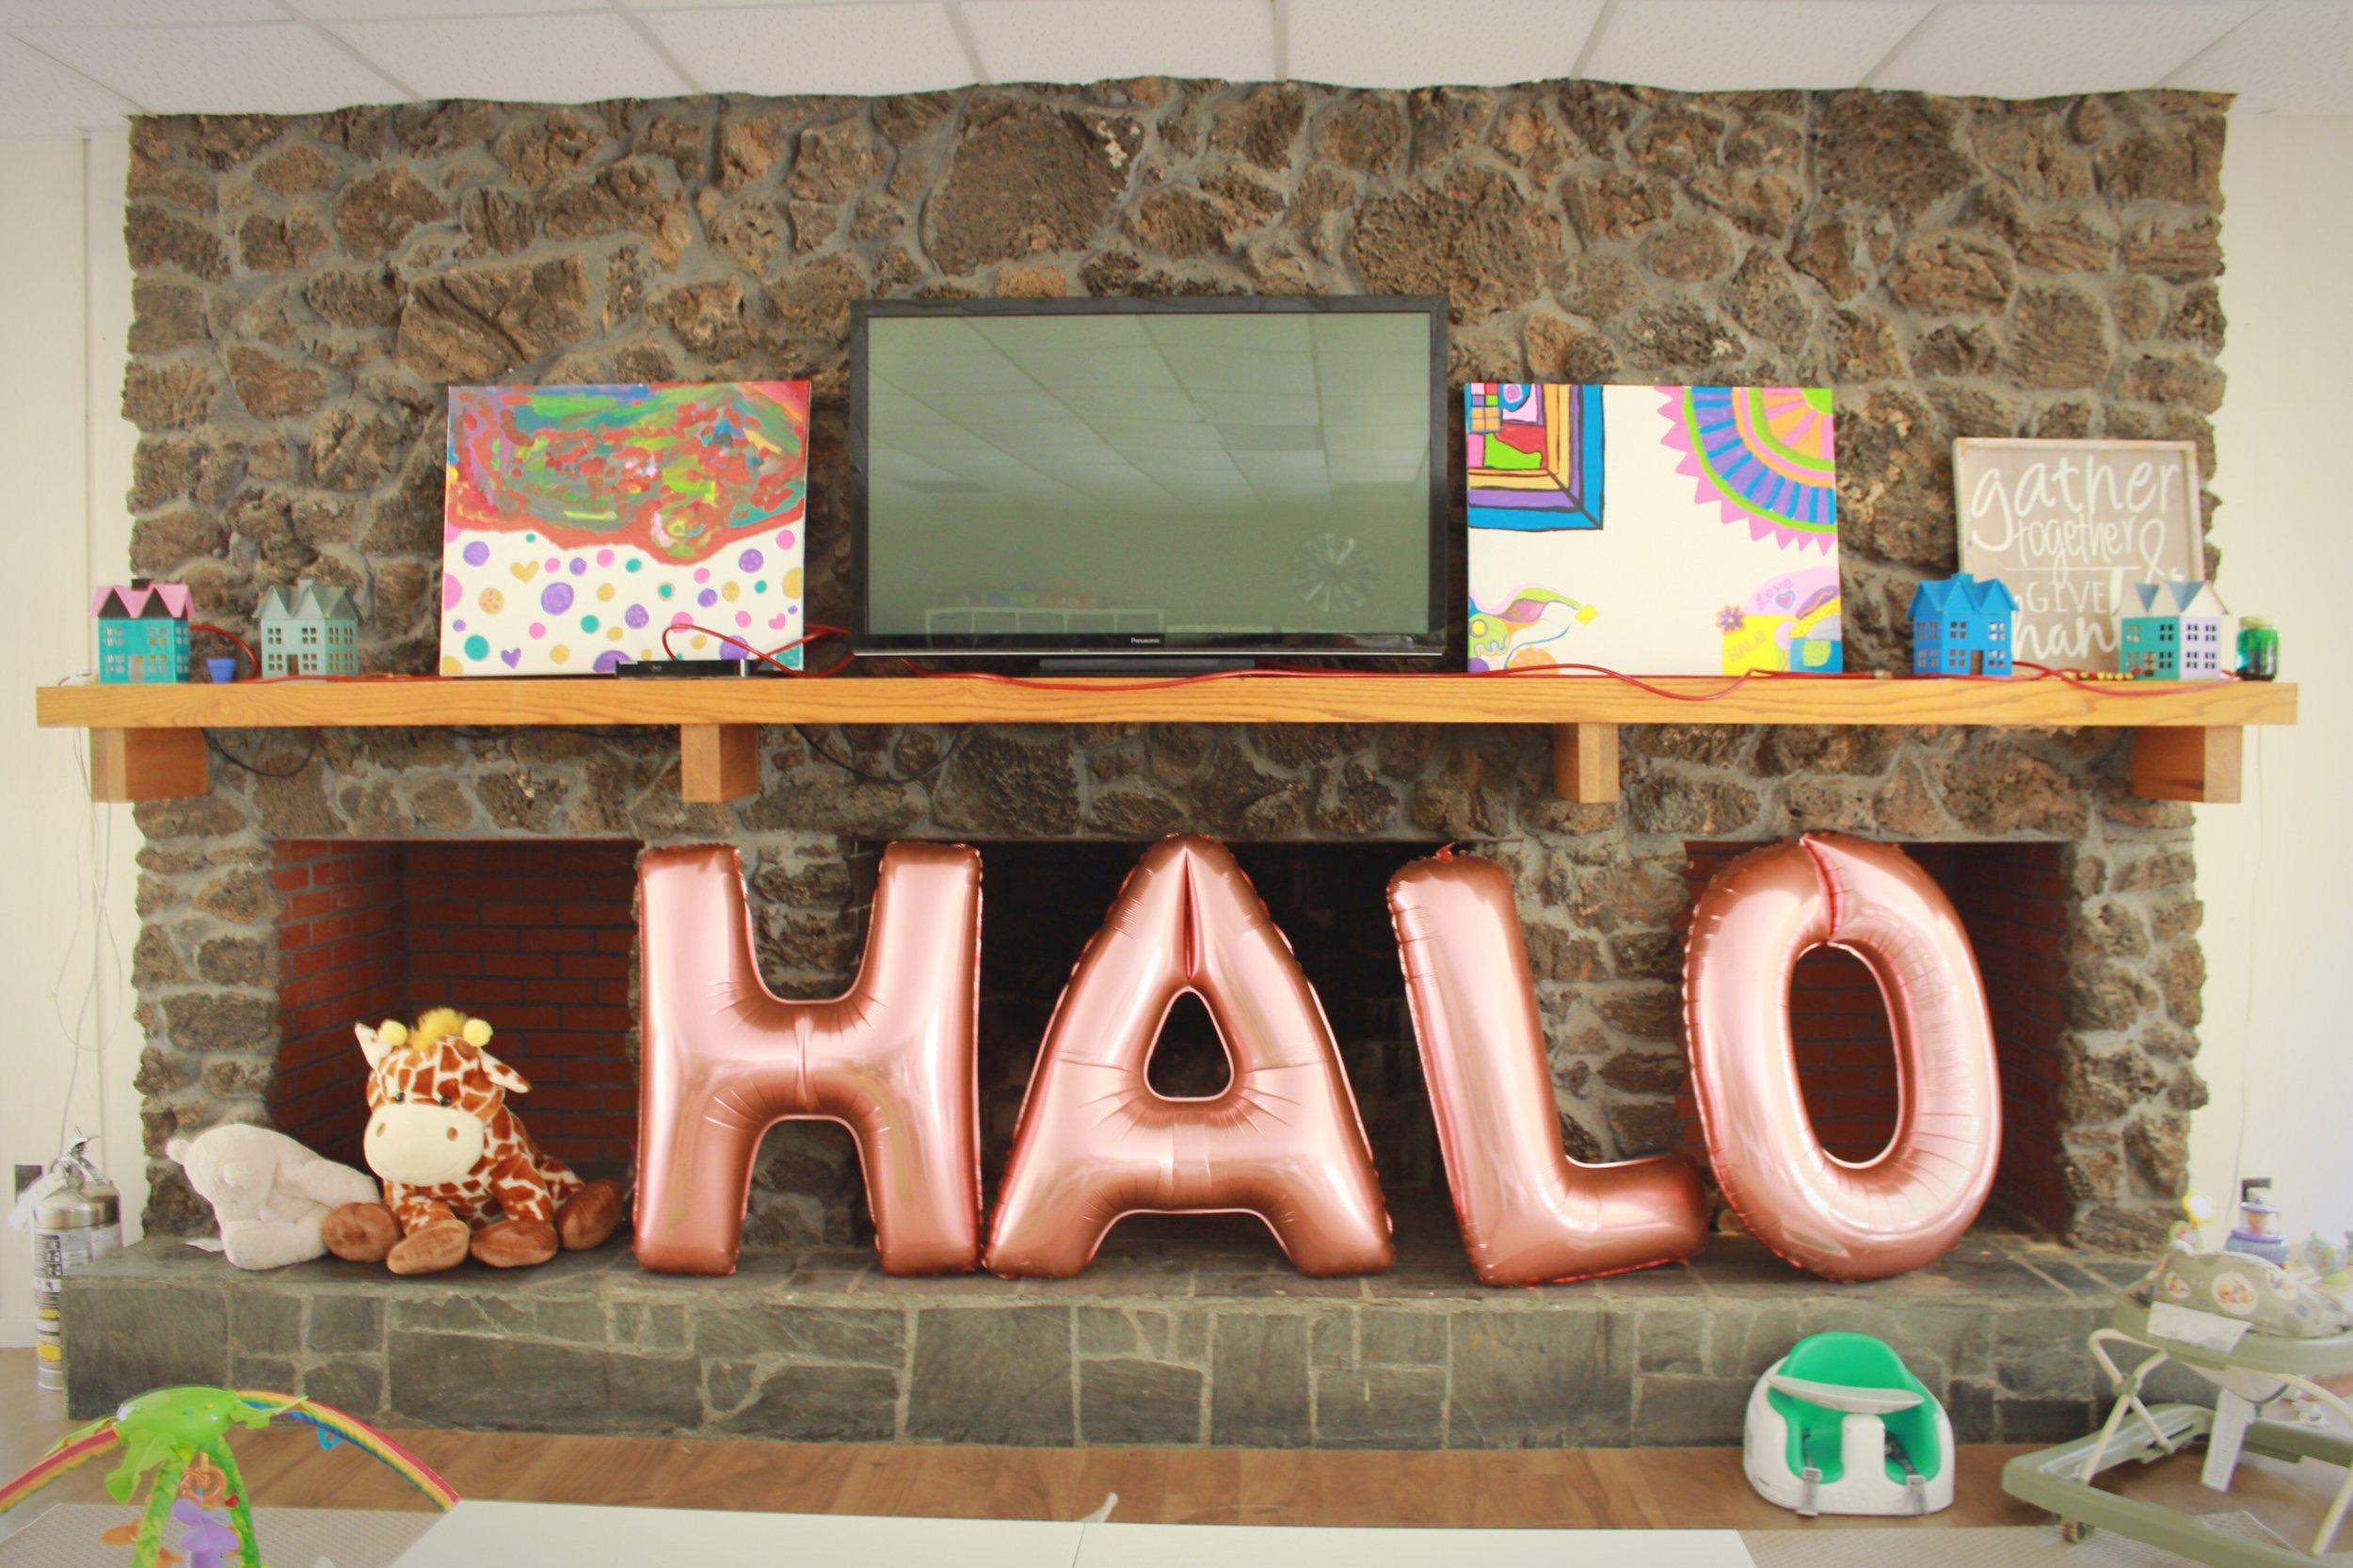 halo-house-jefferson-city-mo-home-for-homeless-teenage-girls-jefferson-city-mo-jeff-city-blog